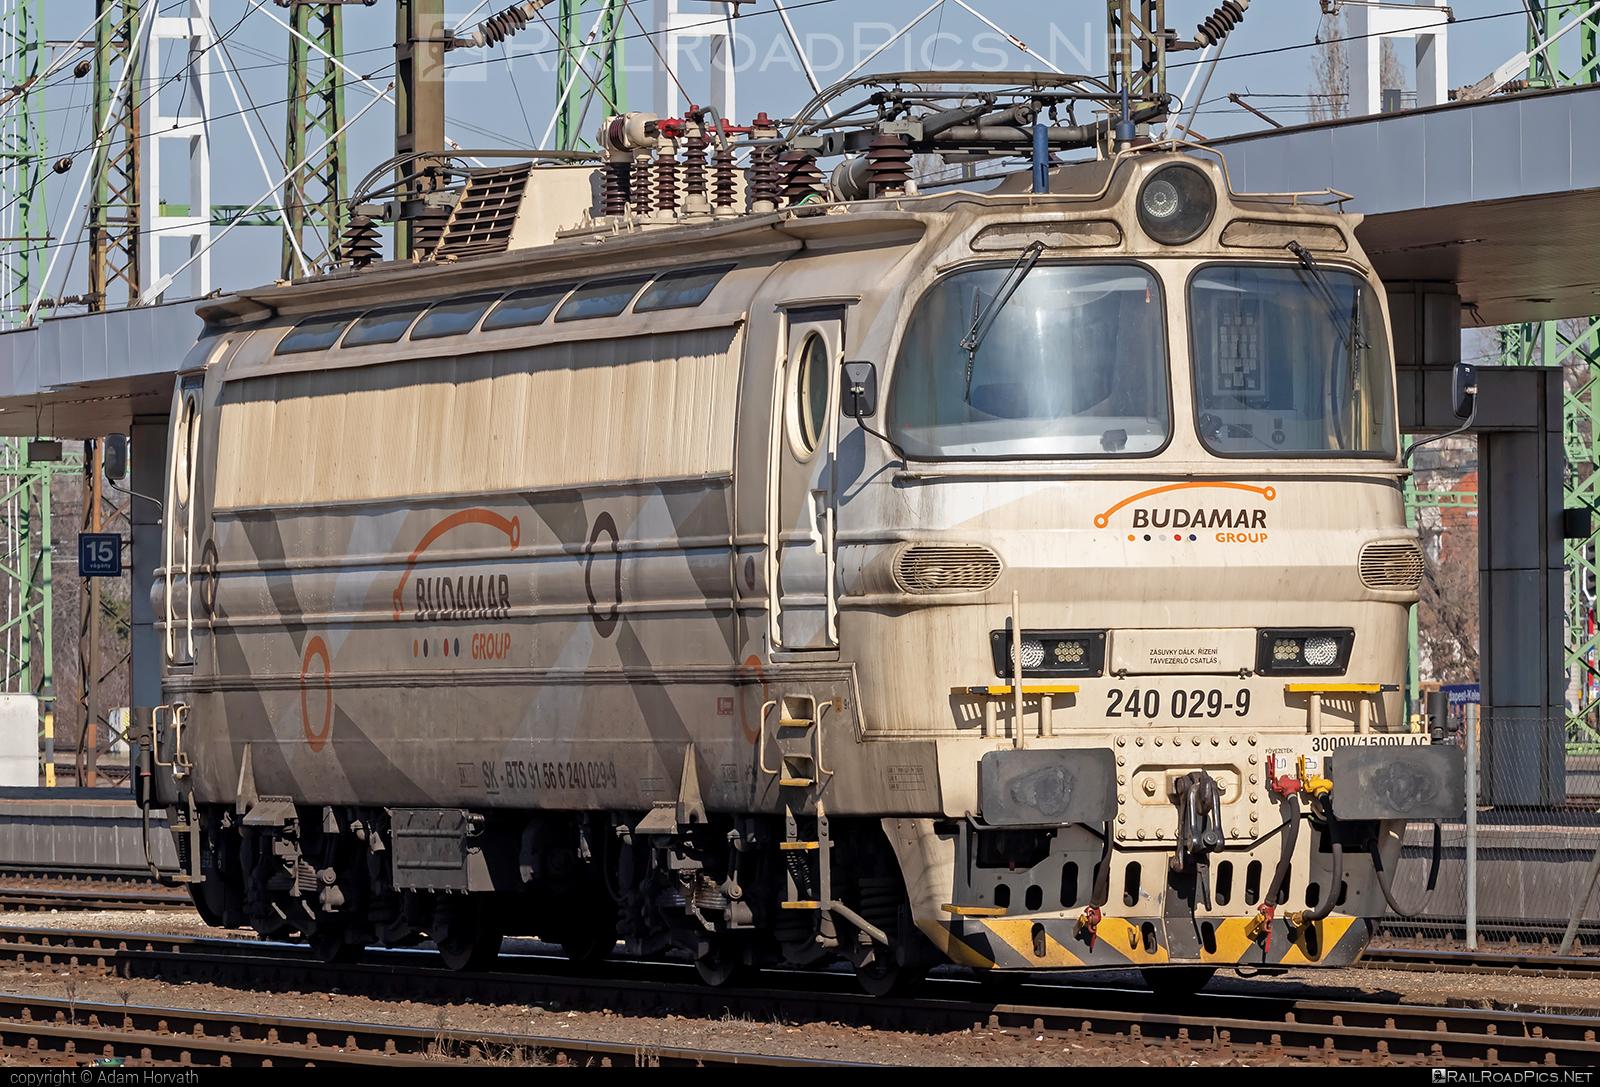 Škoda 47E - 240 029-9 operated by LOKORAIL, a.s. #BulkTransshipmentSlovakia #bts #budamar #laminatka #locomotive240 #lokorail #lrl #skoda #skoda47e